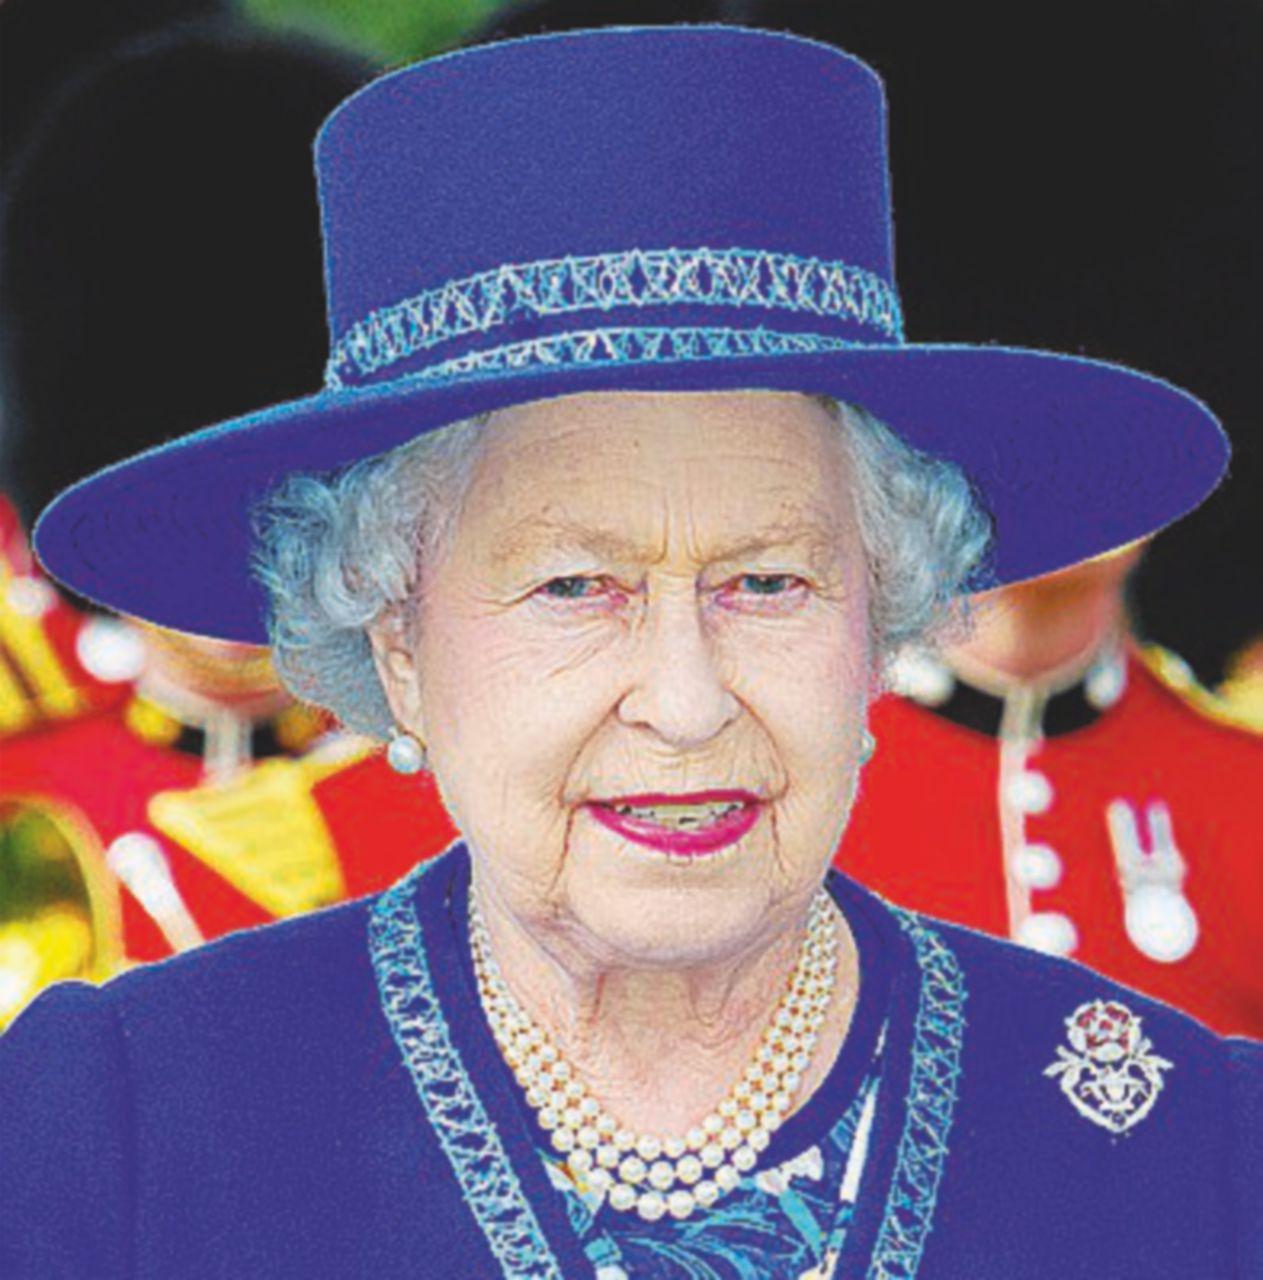 Cara Queen Elisabeth, accogli i bambini siriani. Tuo, Dario Fo